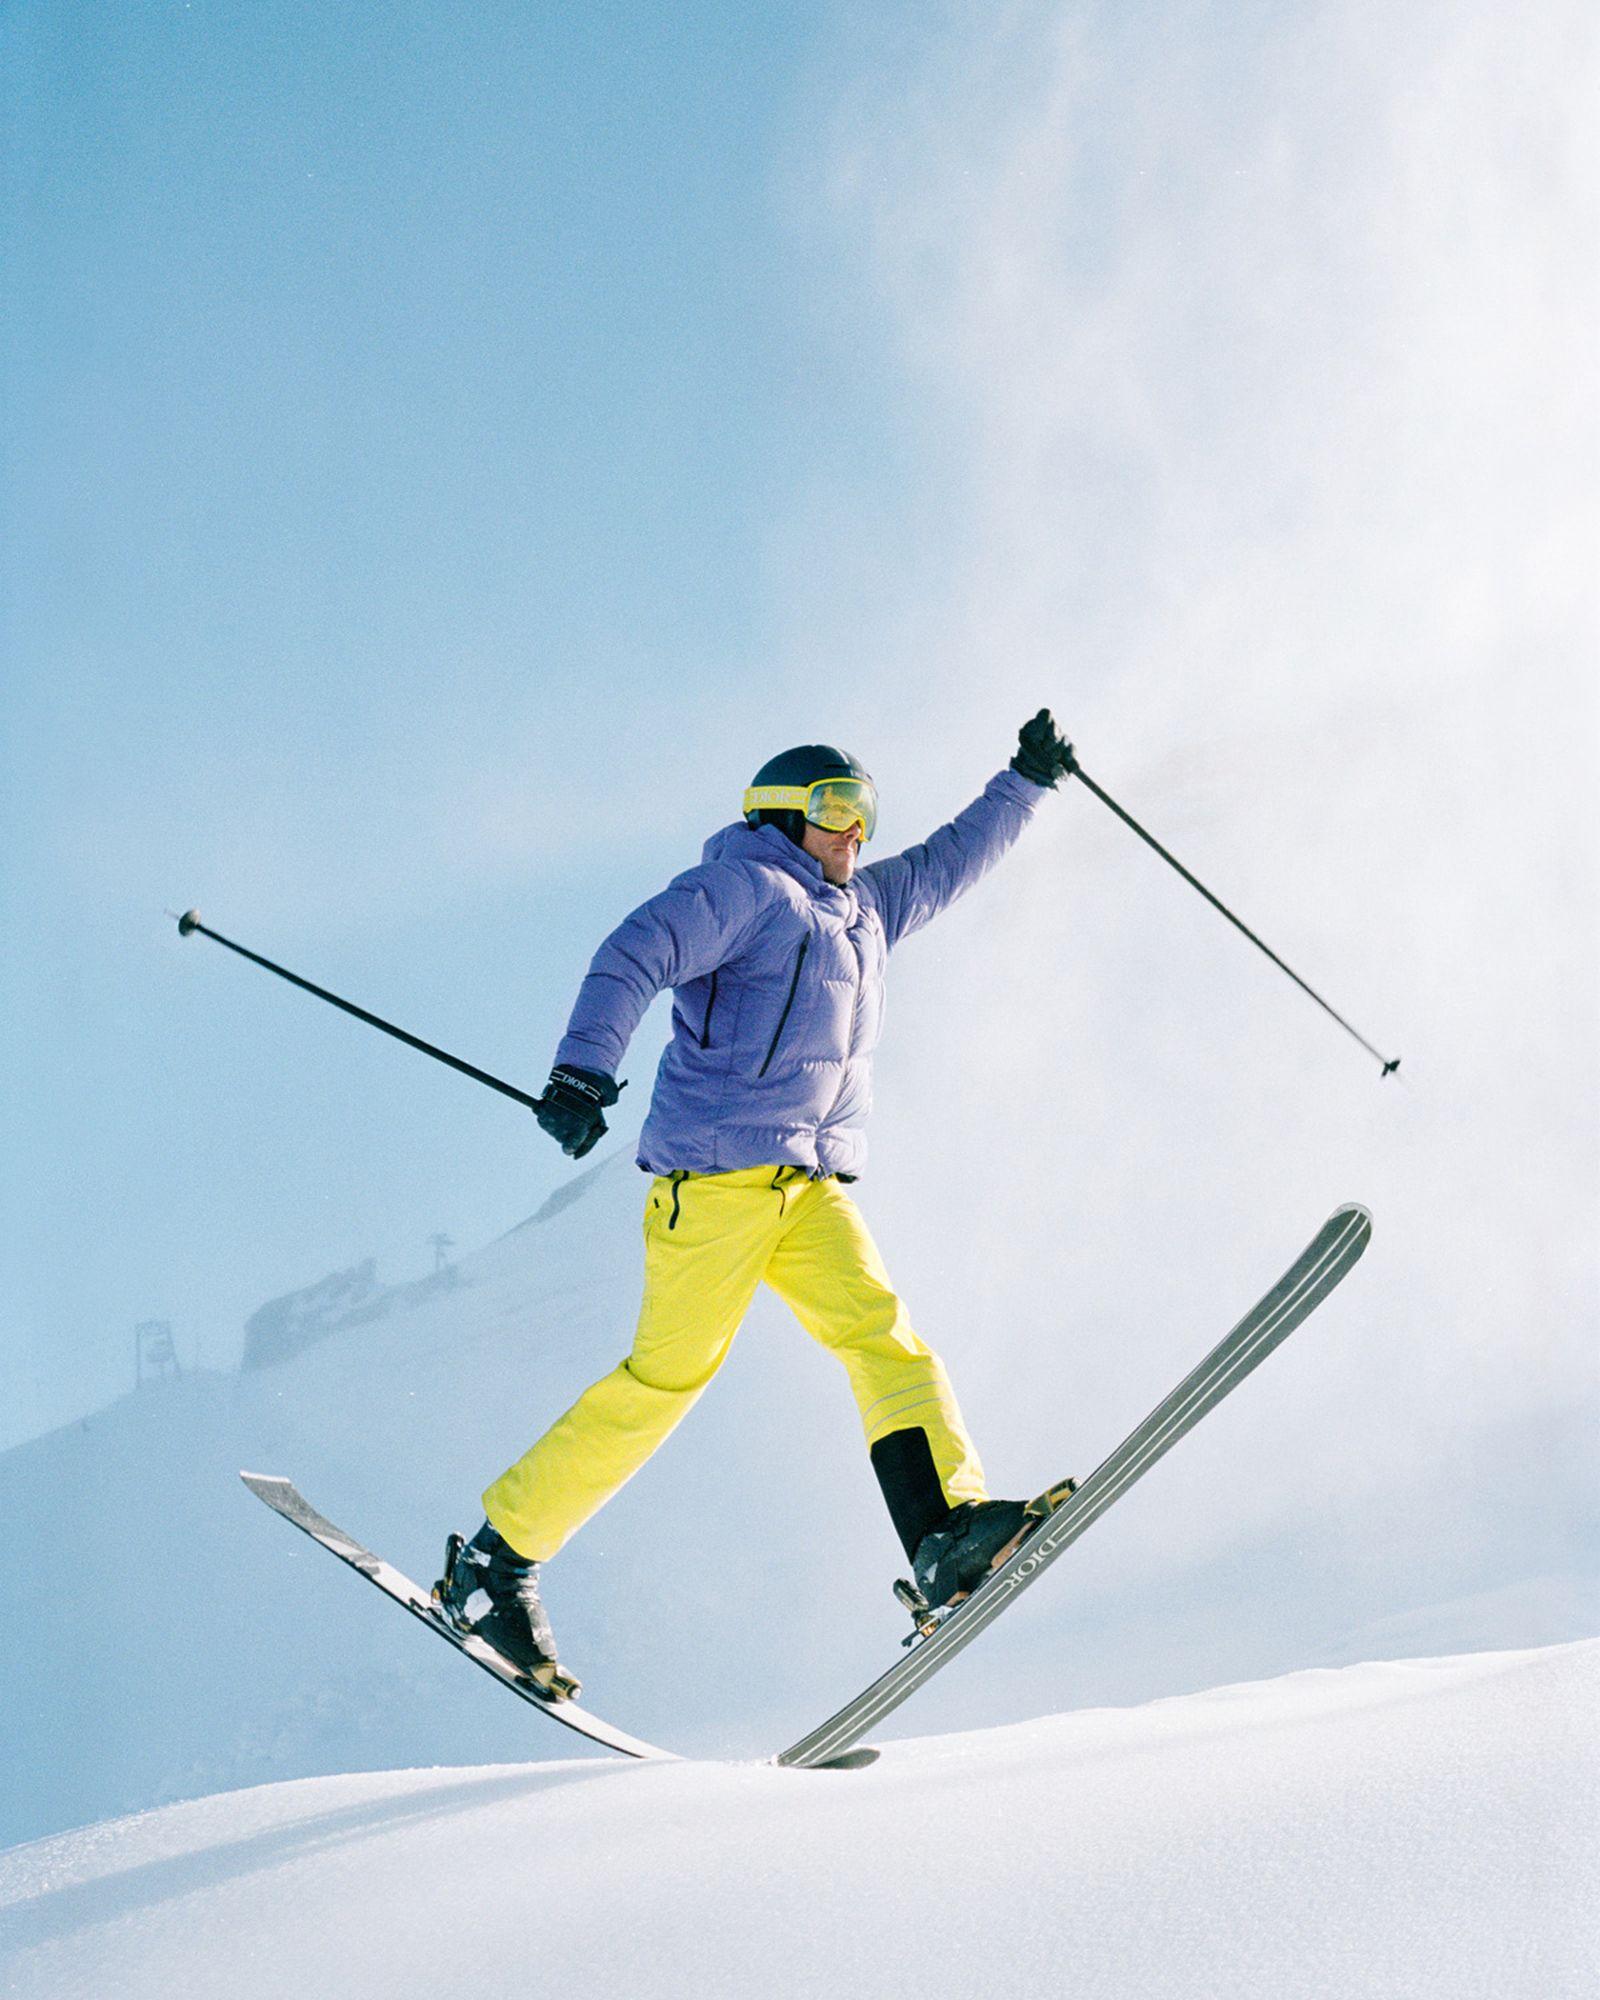 dior-ski-capsule-04